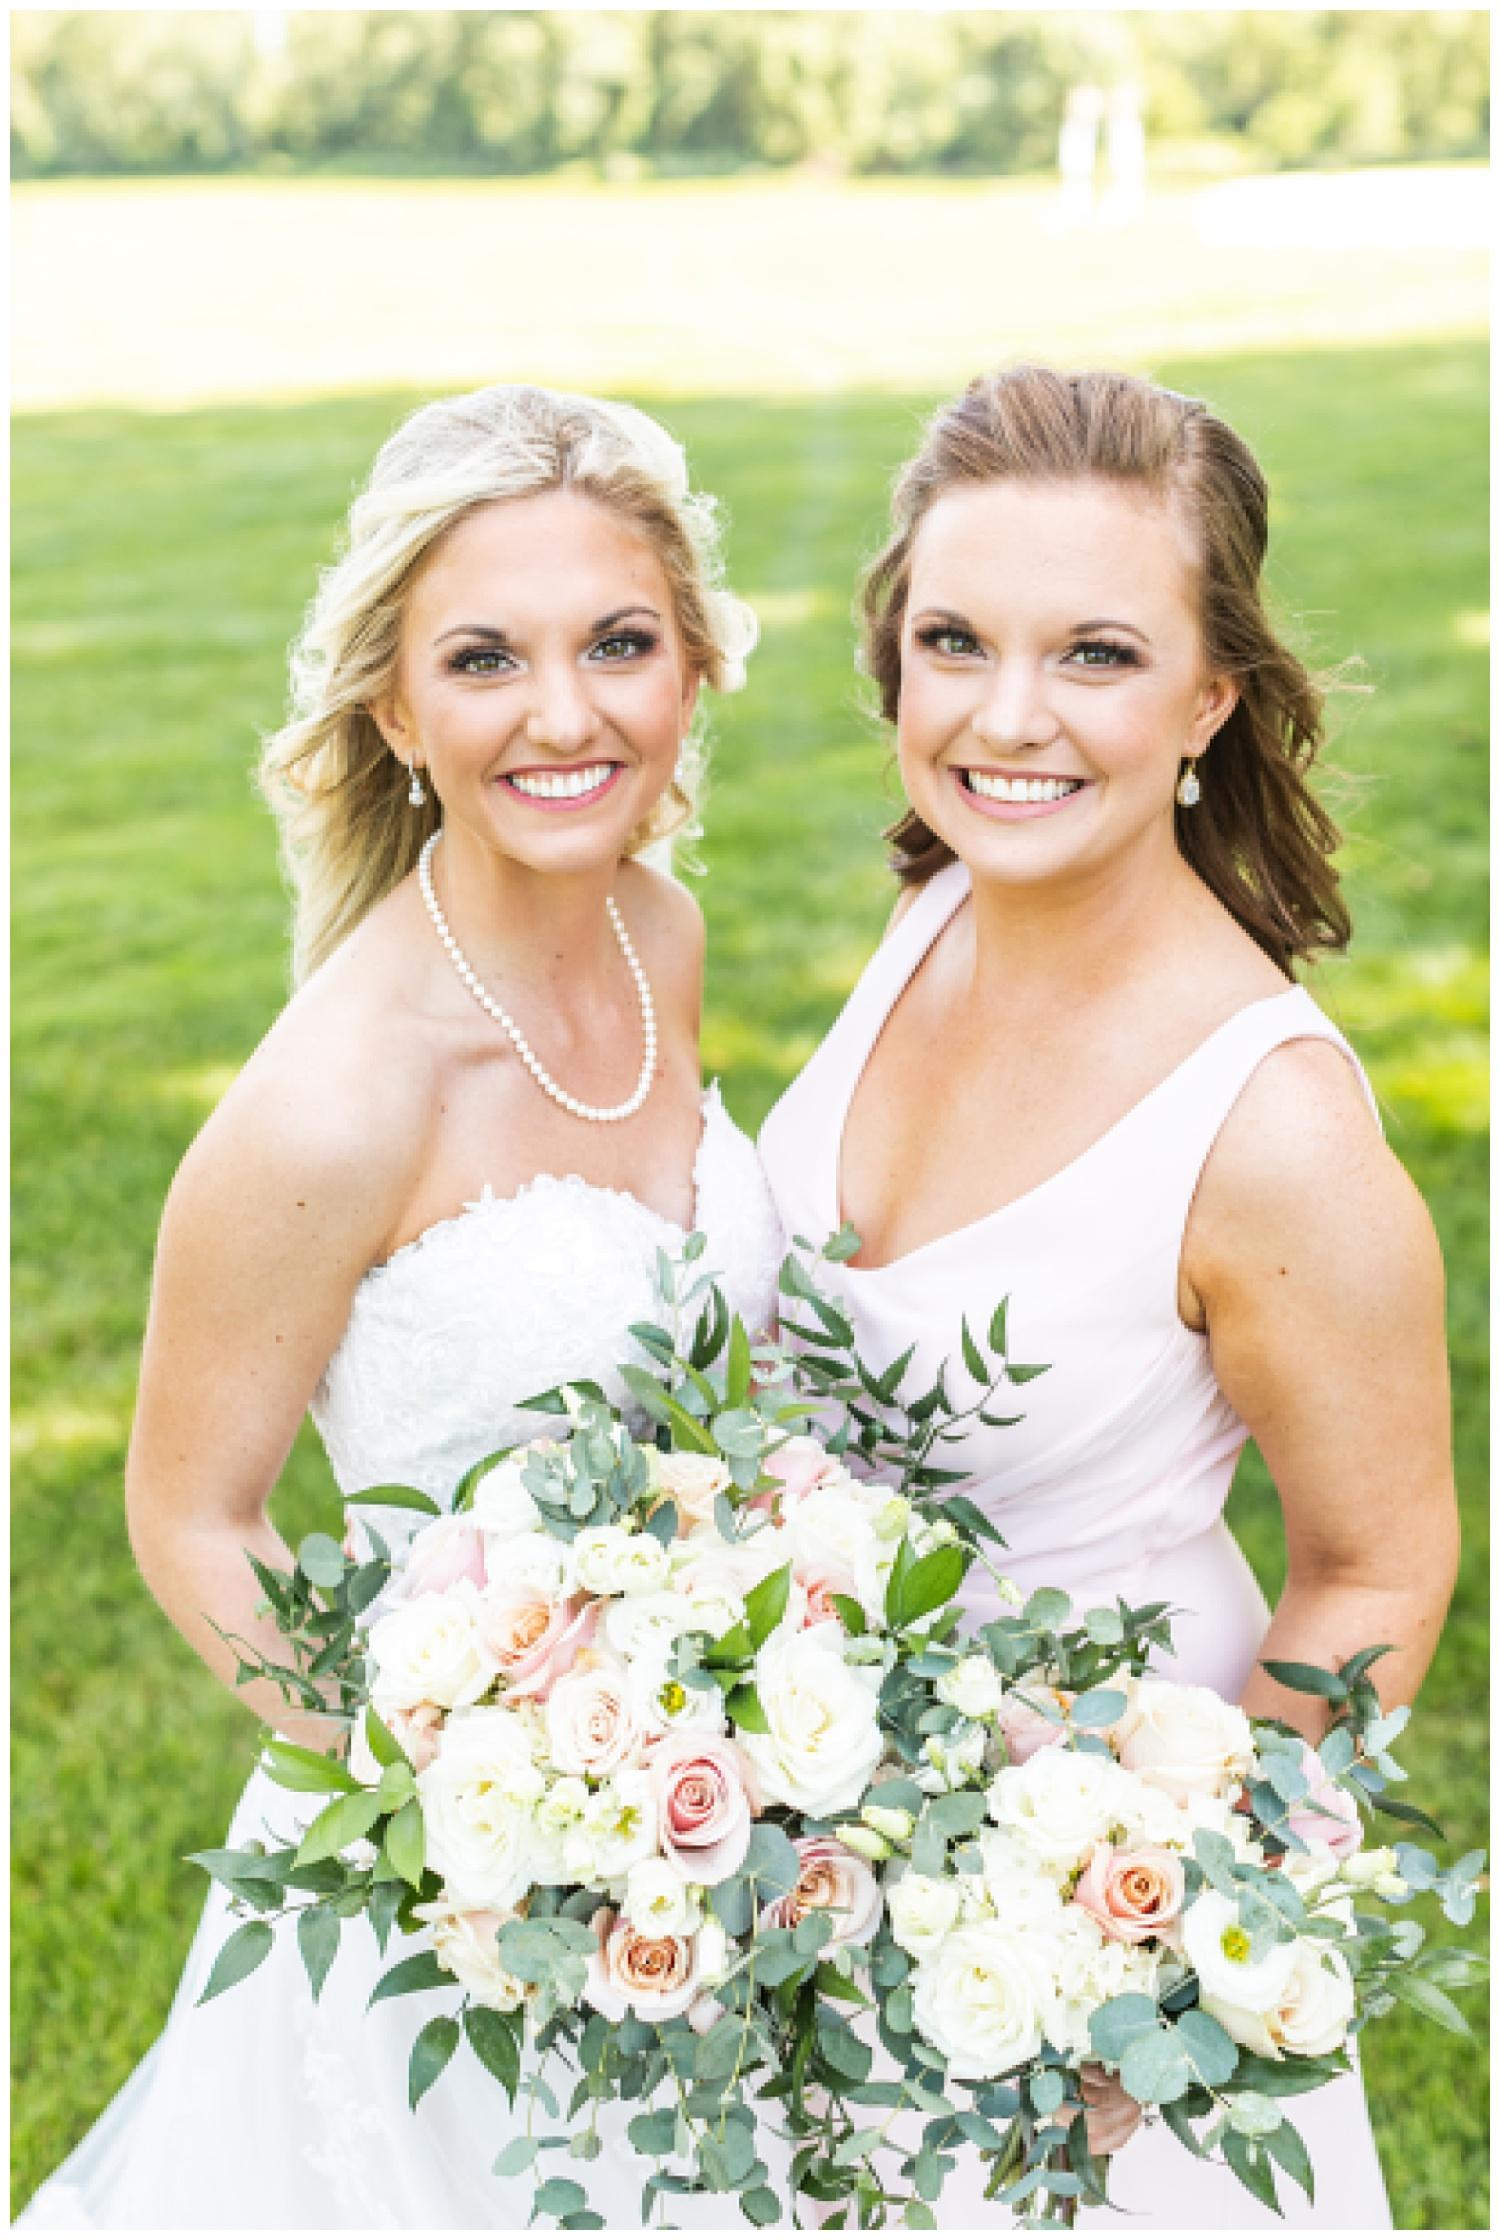 Kelly Mike Swan Harbor Farm Wedding Living Radiant Photography photos_0066.jpg